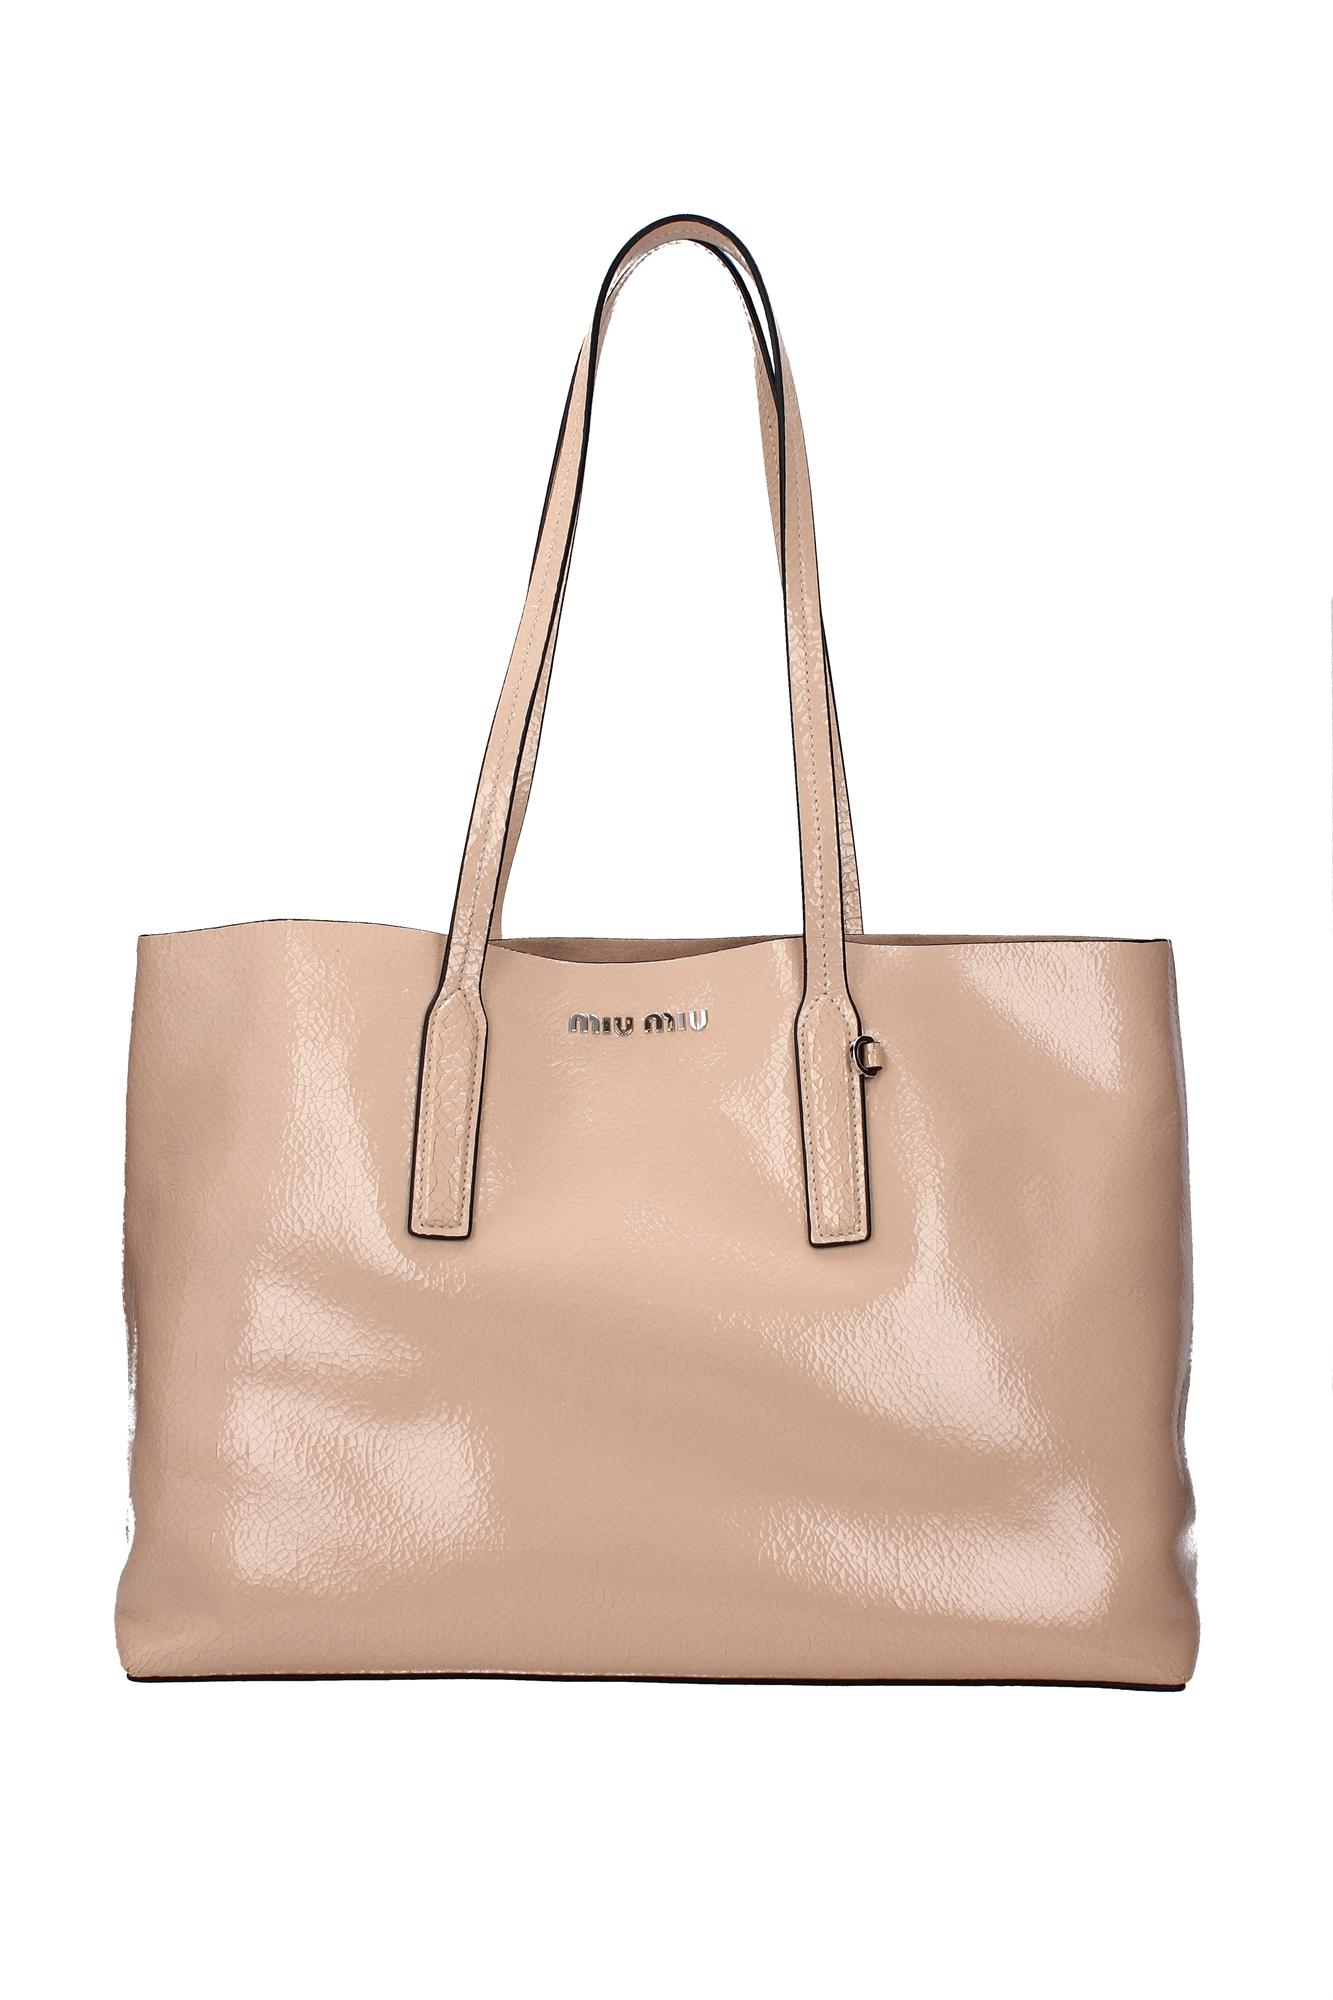 Borse Shopping Miu Miu Donna Pelle Rosa 5bg024cipria - miu miu - ebay.it